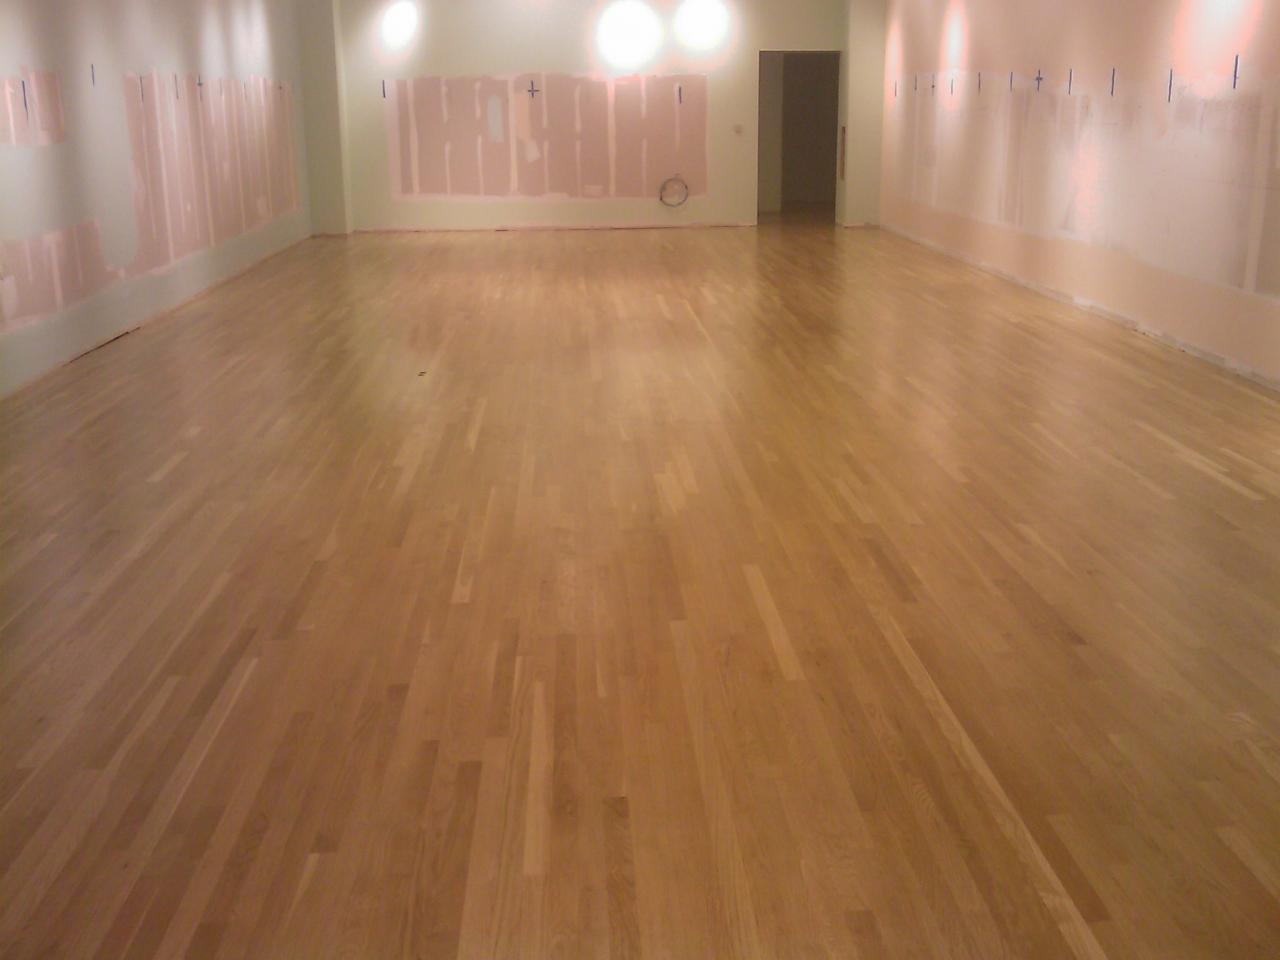 Commercial Hardwood Flooring commercial hardwood flooring contractor athletic fitness floor installations hardwood vinyl and laminate Commercial Hardwood Floor Services